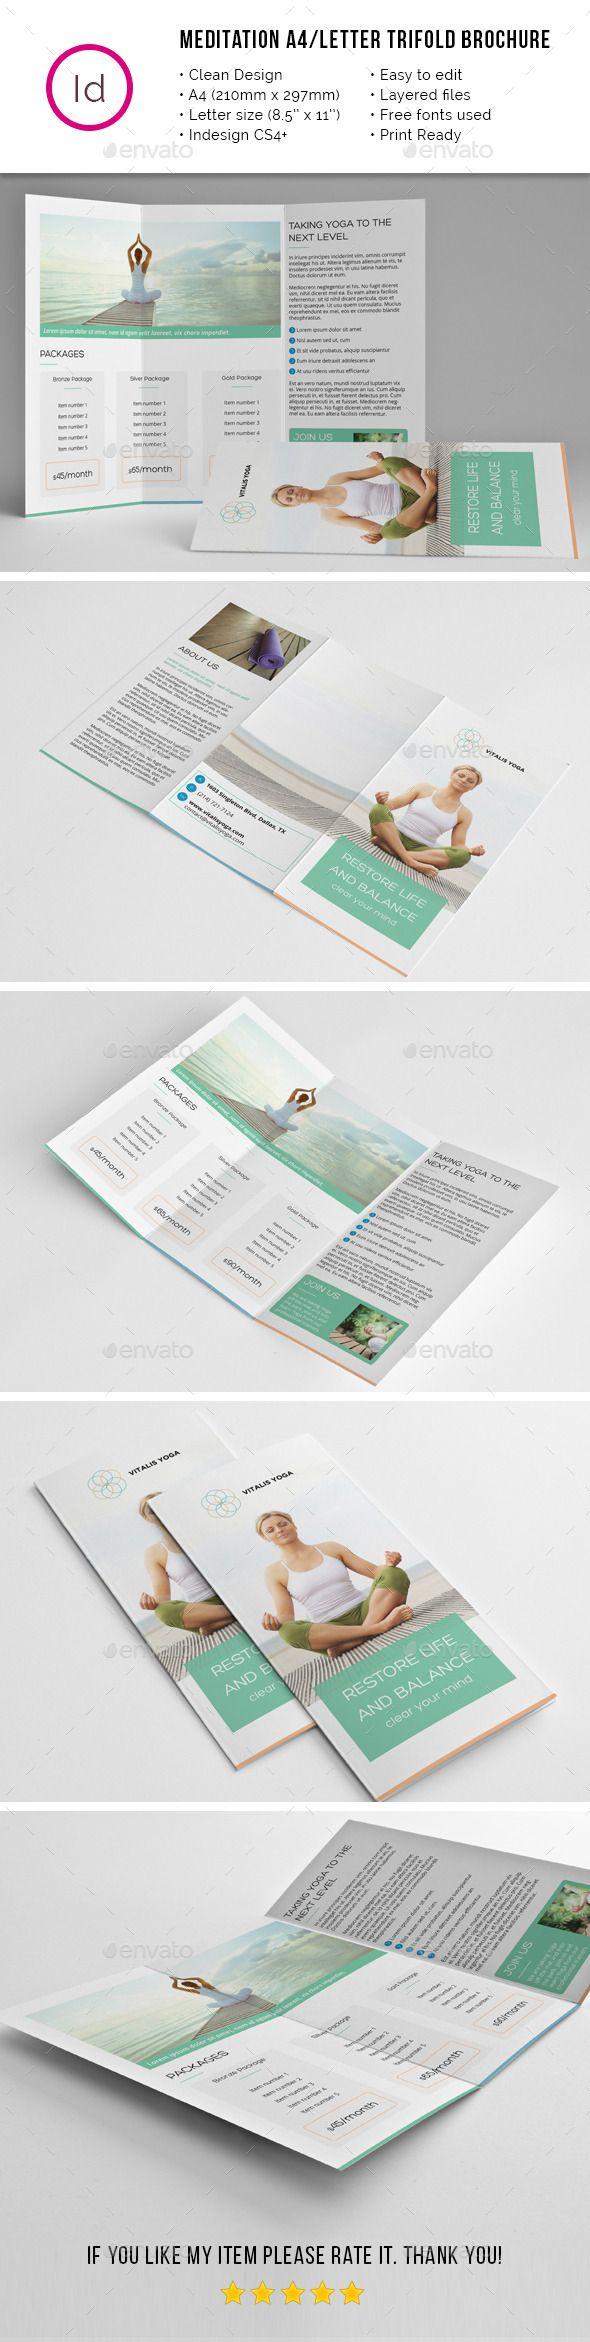 Yoga Meditation A4 / Letter Trifold Brochure Template #design Download: http://graphicriver.net/item/yoga-meditation-a4-letter-trifold-brochure/11752797?ref=ksioks